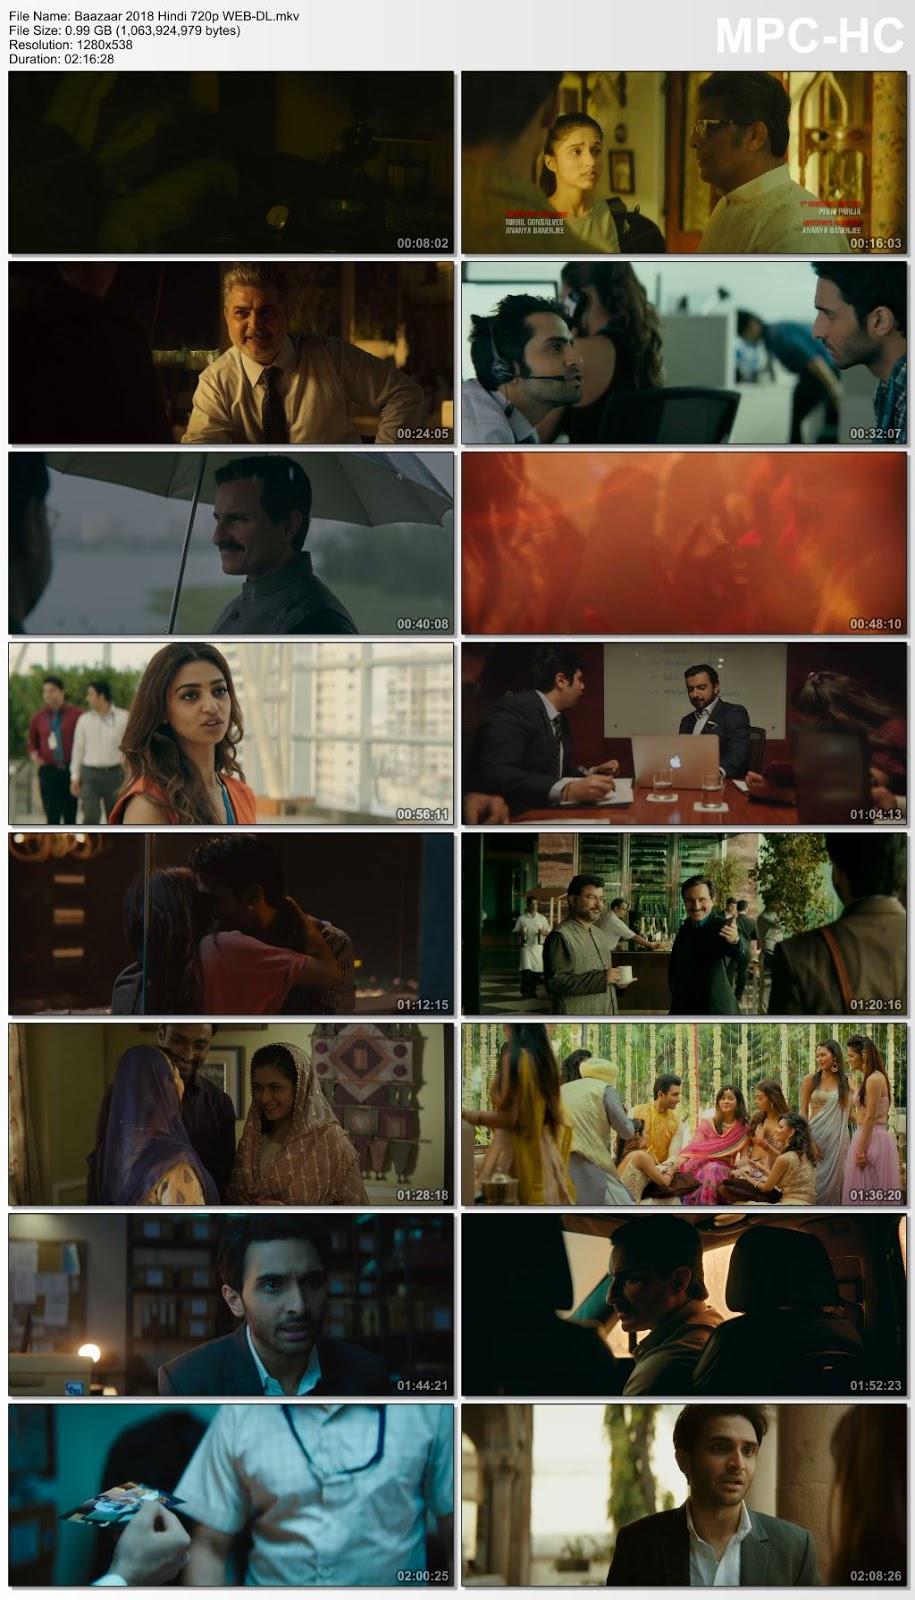 Baazaar 2018 Hindi 720p WEB-DL 1GB Desirehub